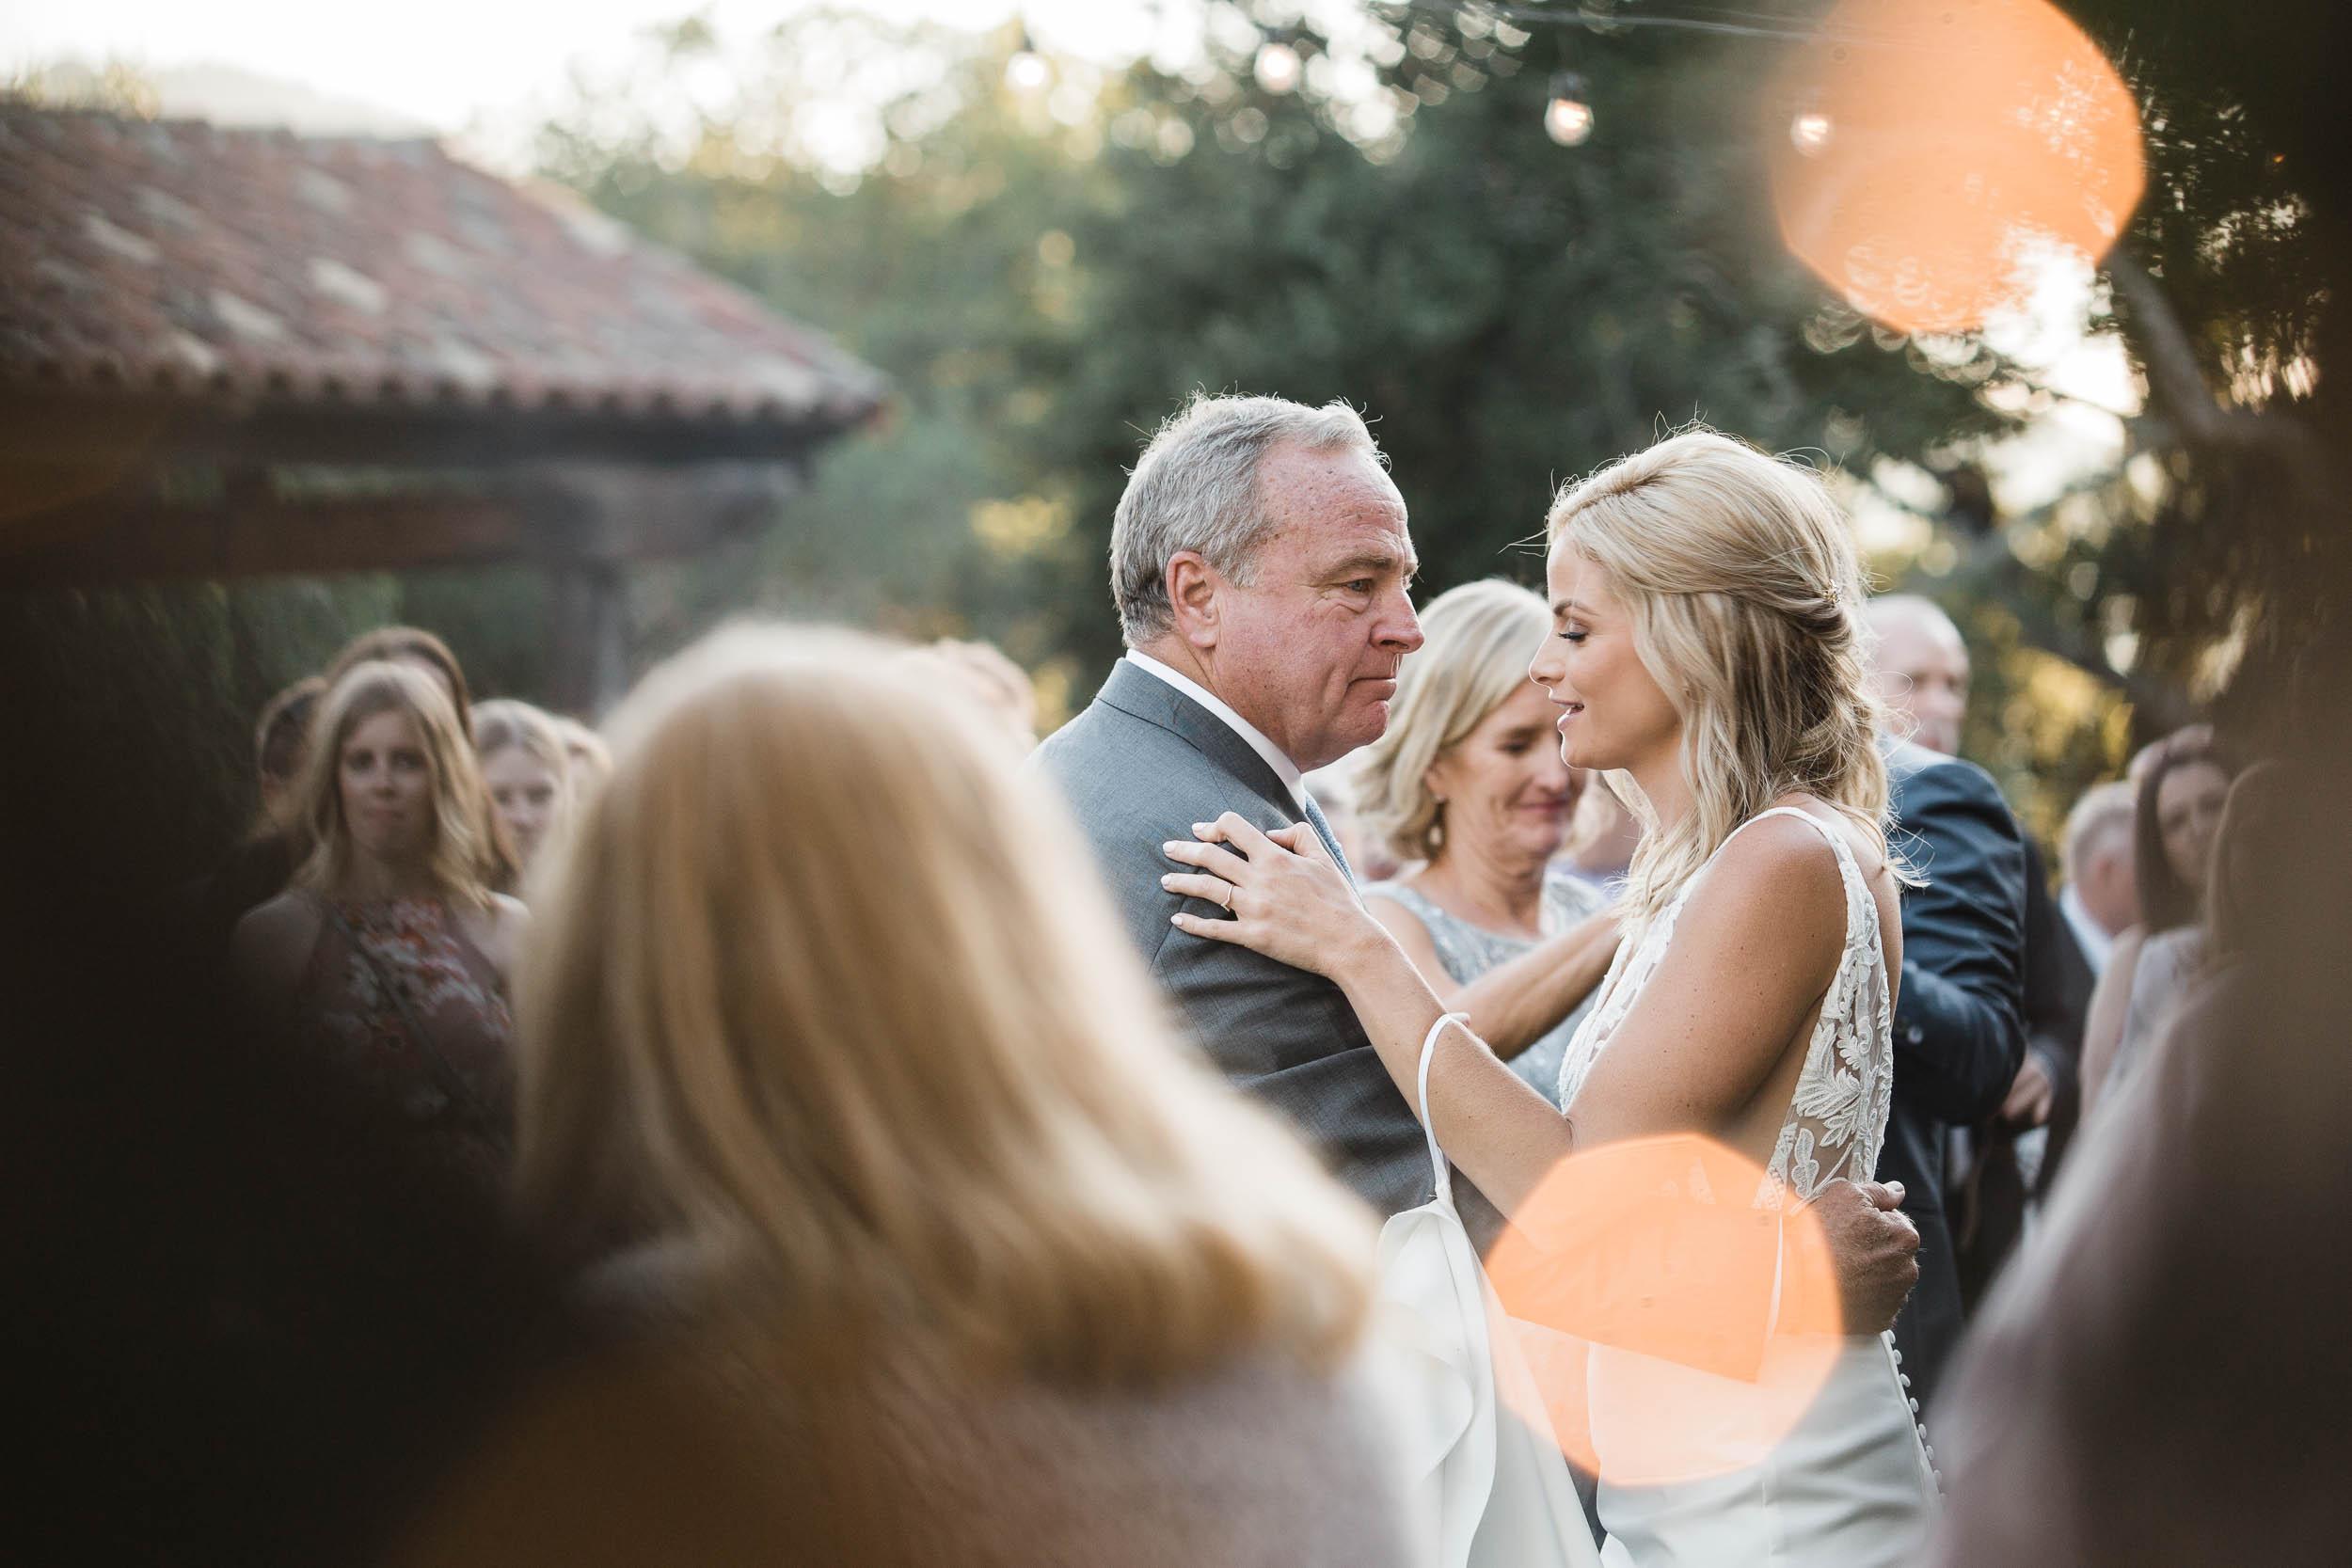 124_072118_D+K_Holman Ranch Wedding_Buena Lane Photography_3578TV.jpg